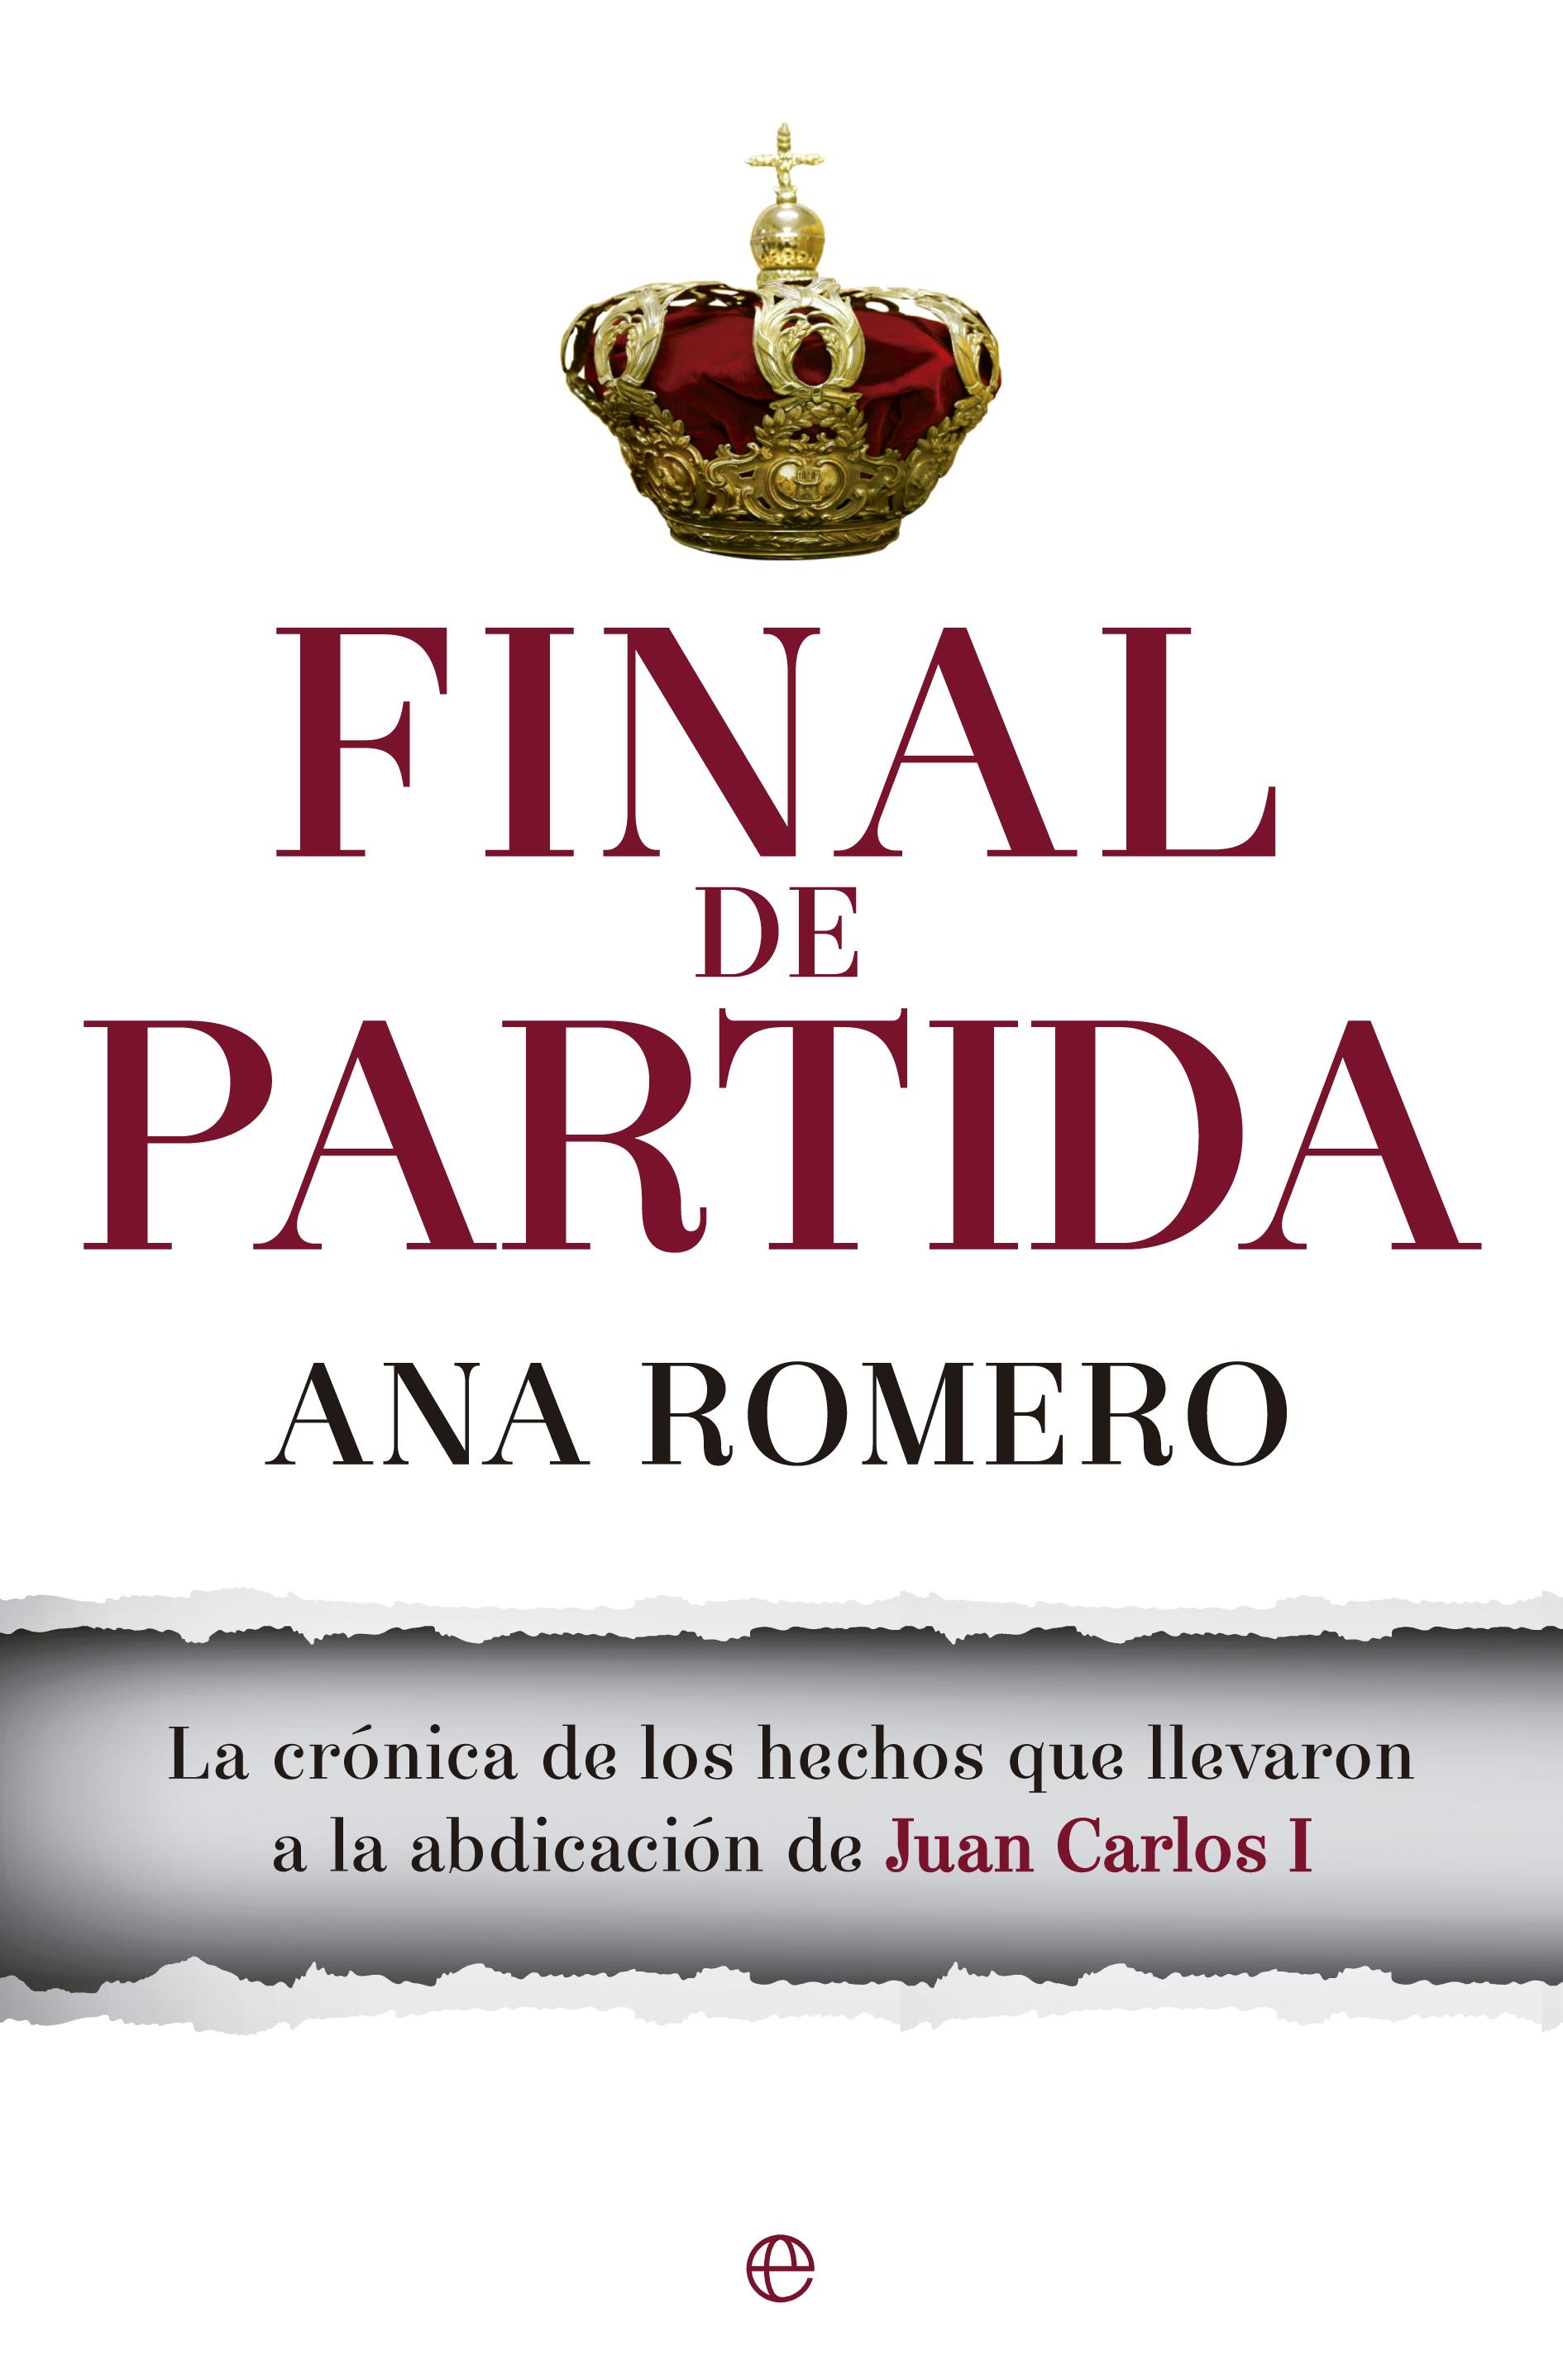 Portada del libro de Ana Romero